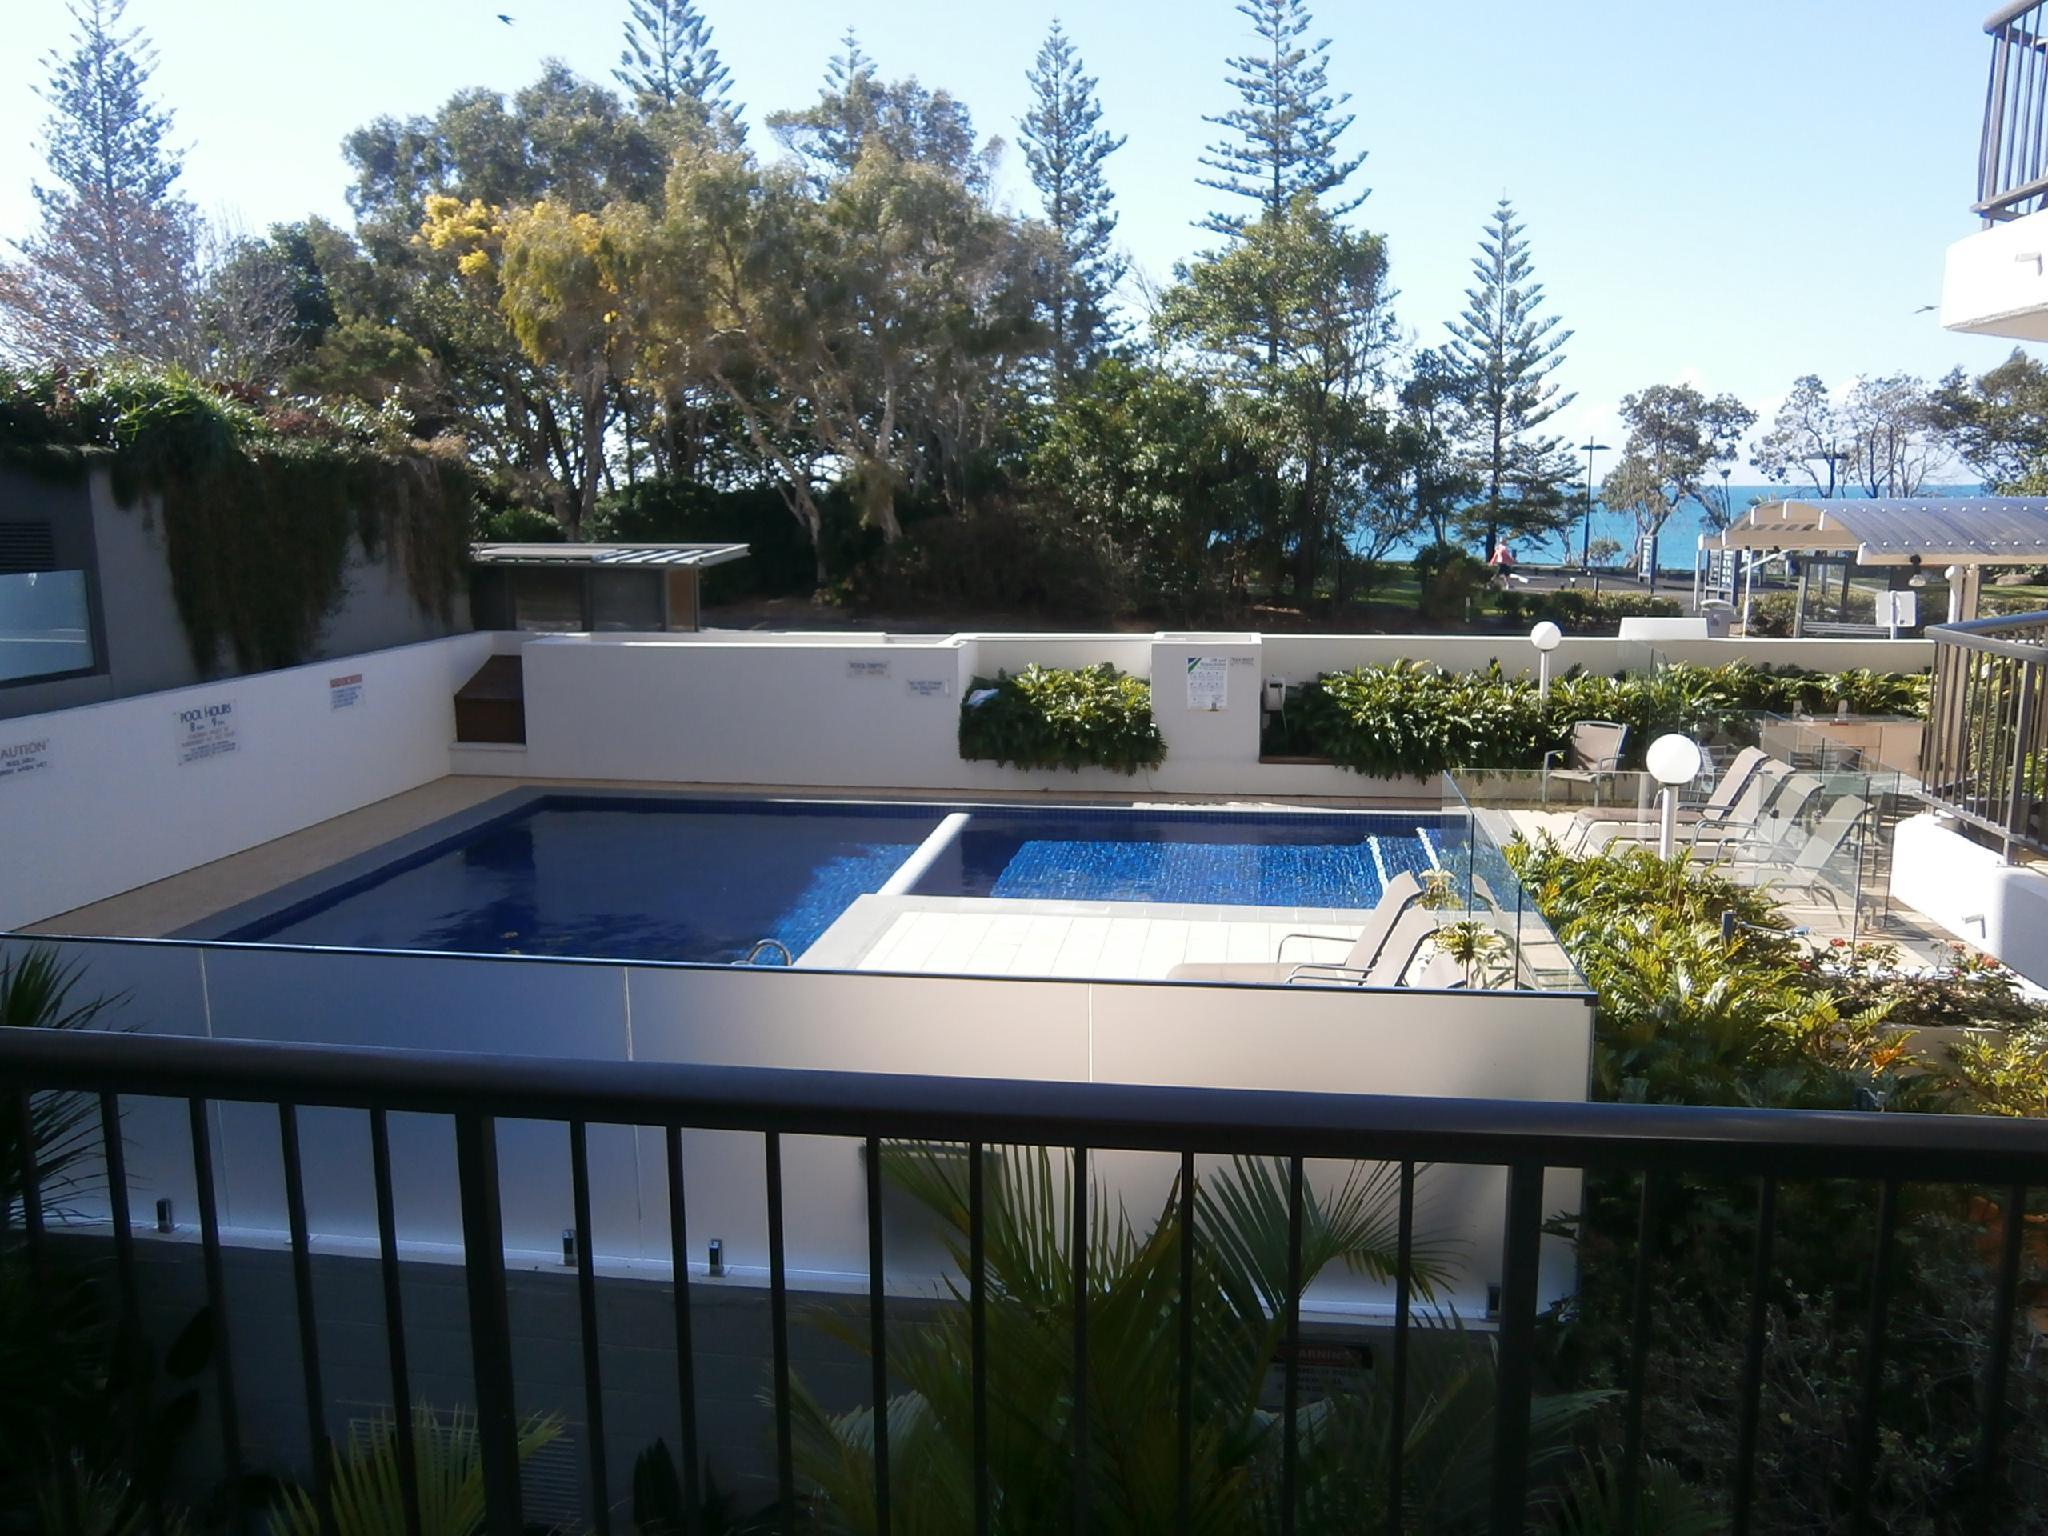 Seaview Resort Mooloolaba